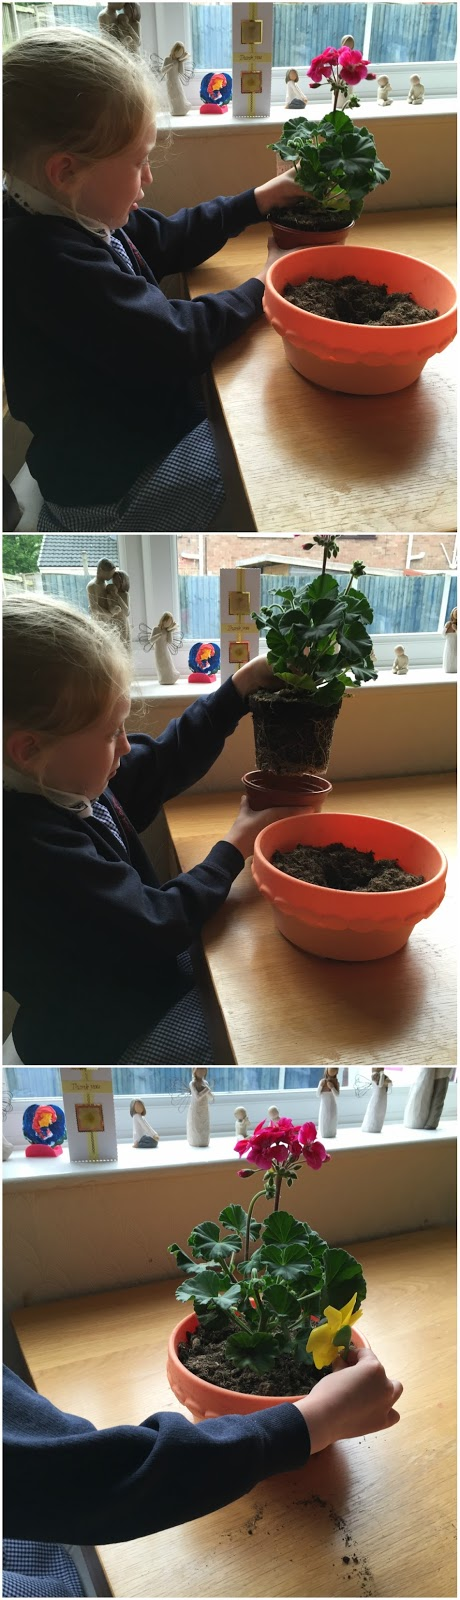 Kira planting her plant